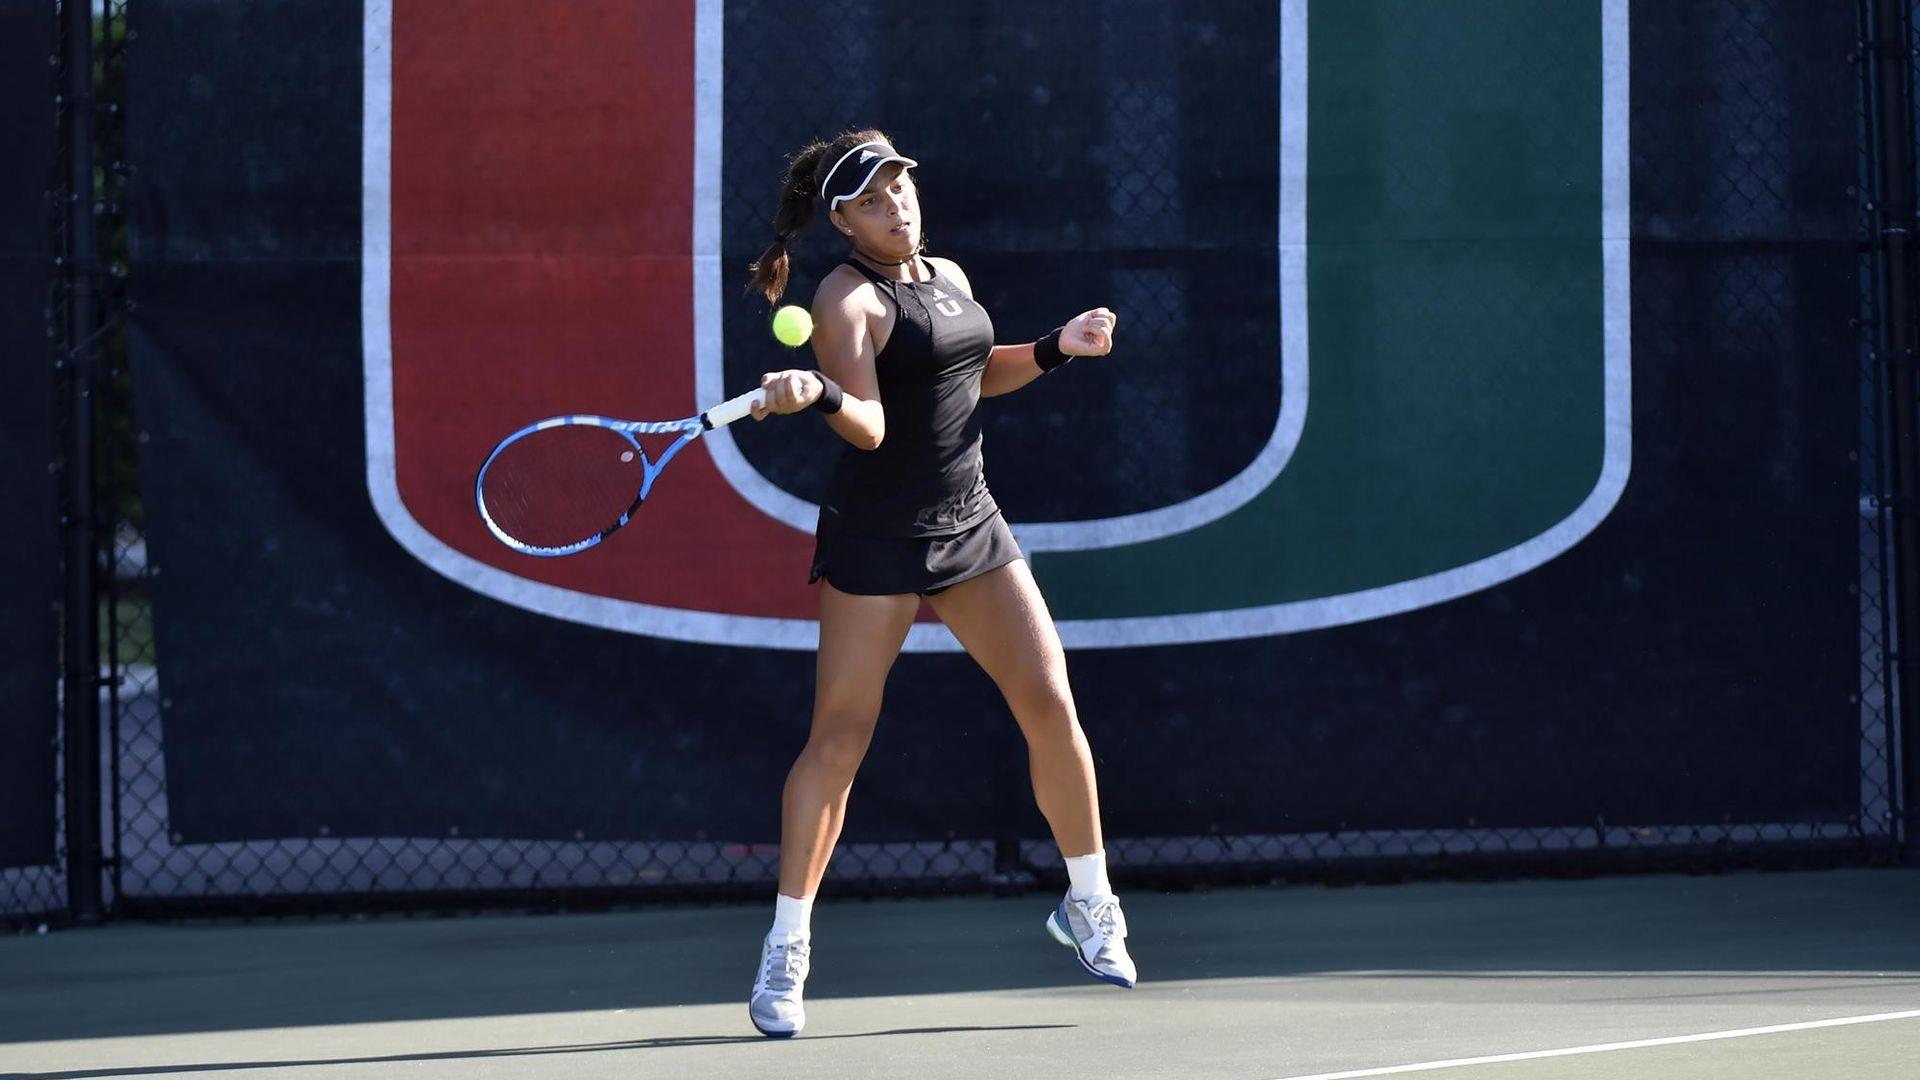 W. Tennis Opens 2019 with Miami Spring Invite